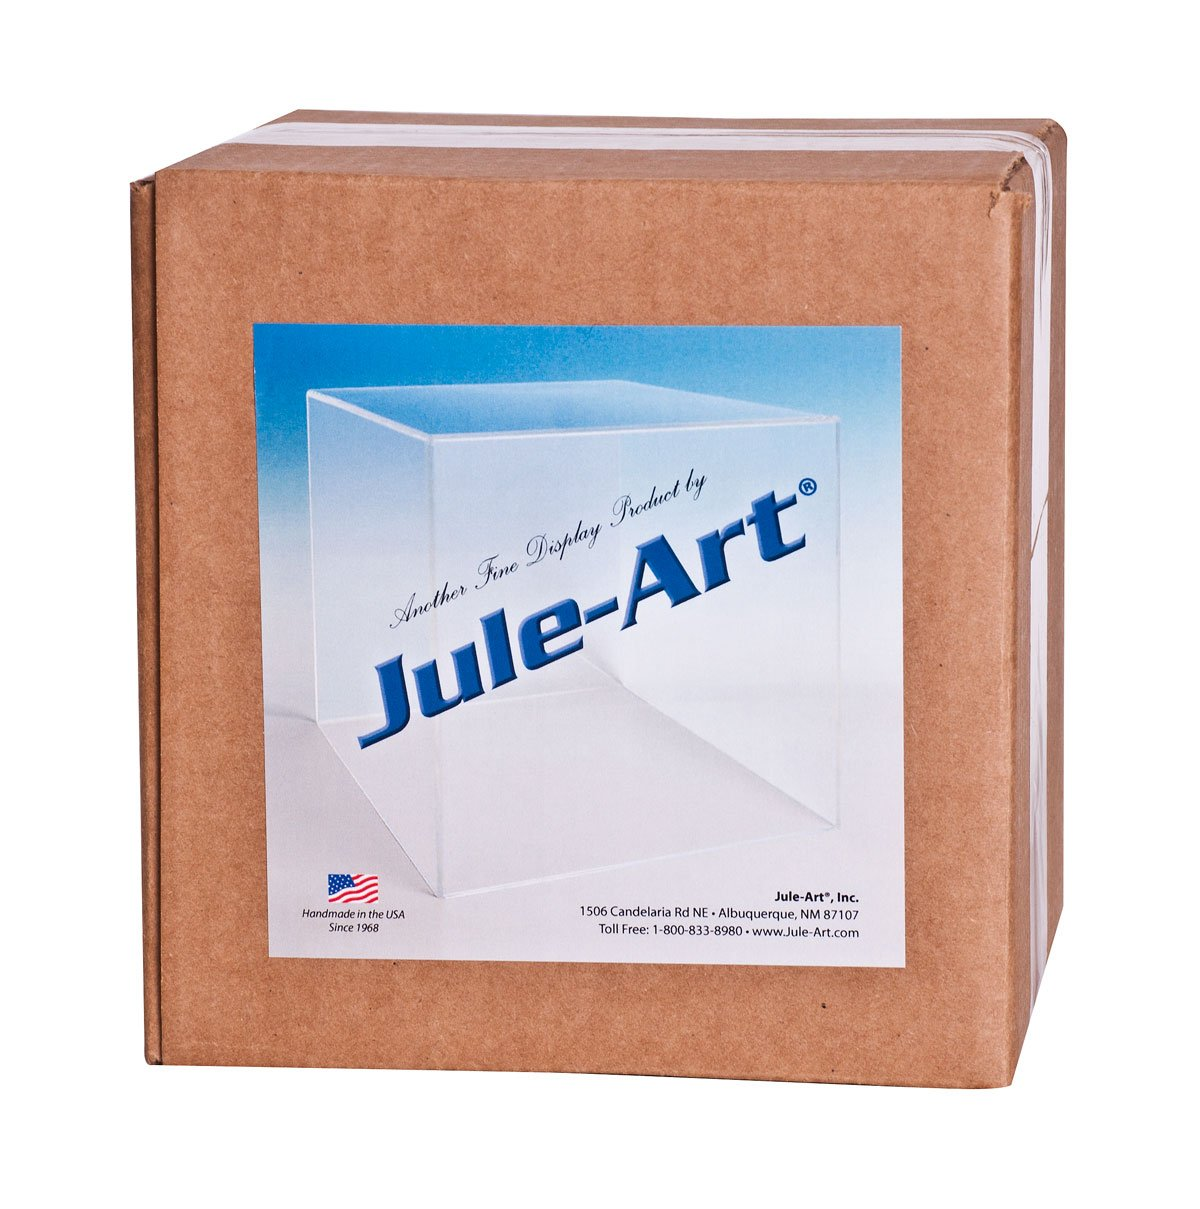 CHOICE ACRYLIC DISPLAYS Acrylic Box Case 5 Sided Display Box Acrylic Cube 9 H x 6 W x 6 D